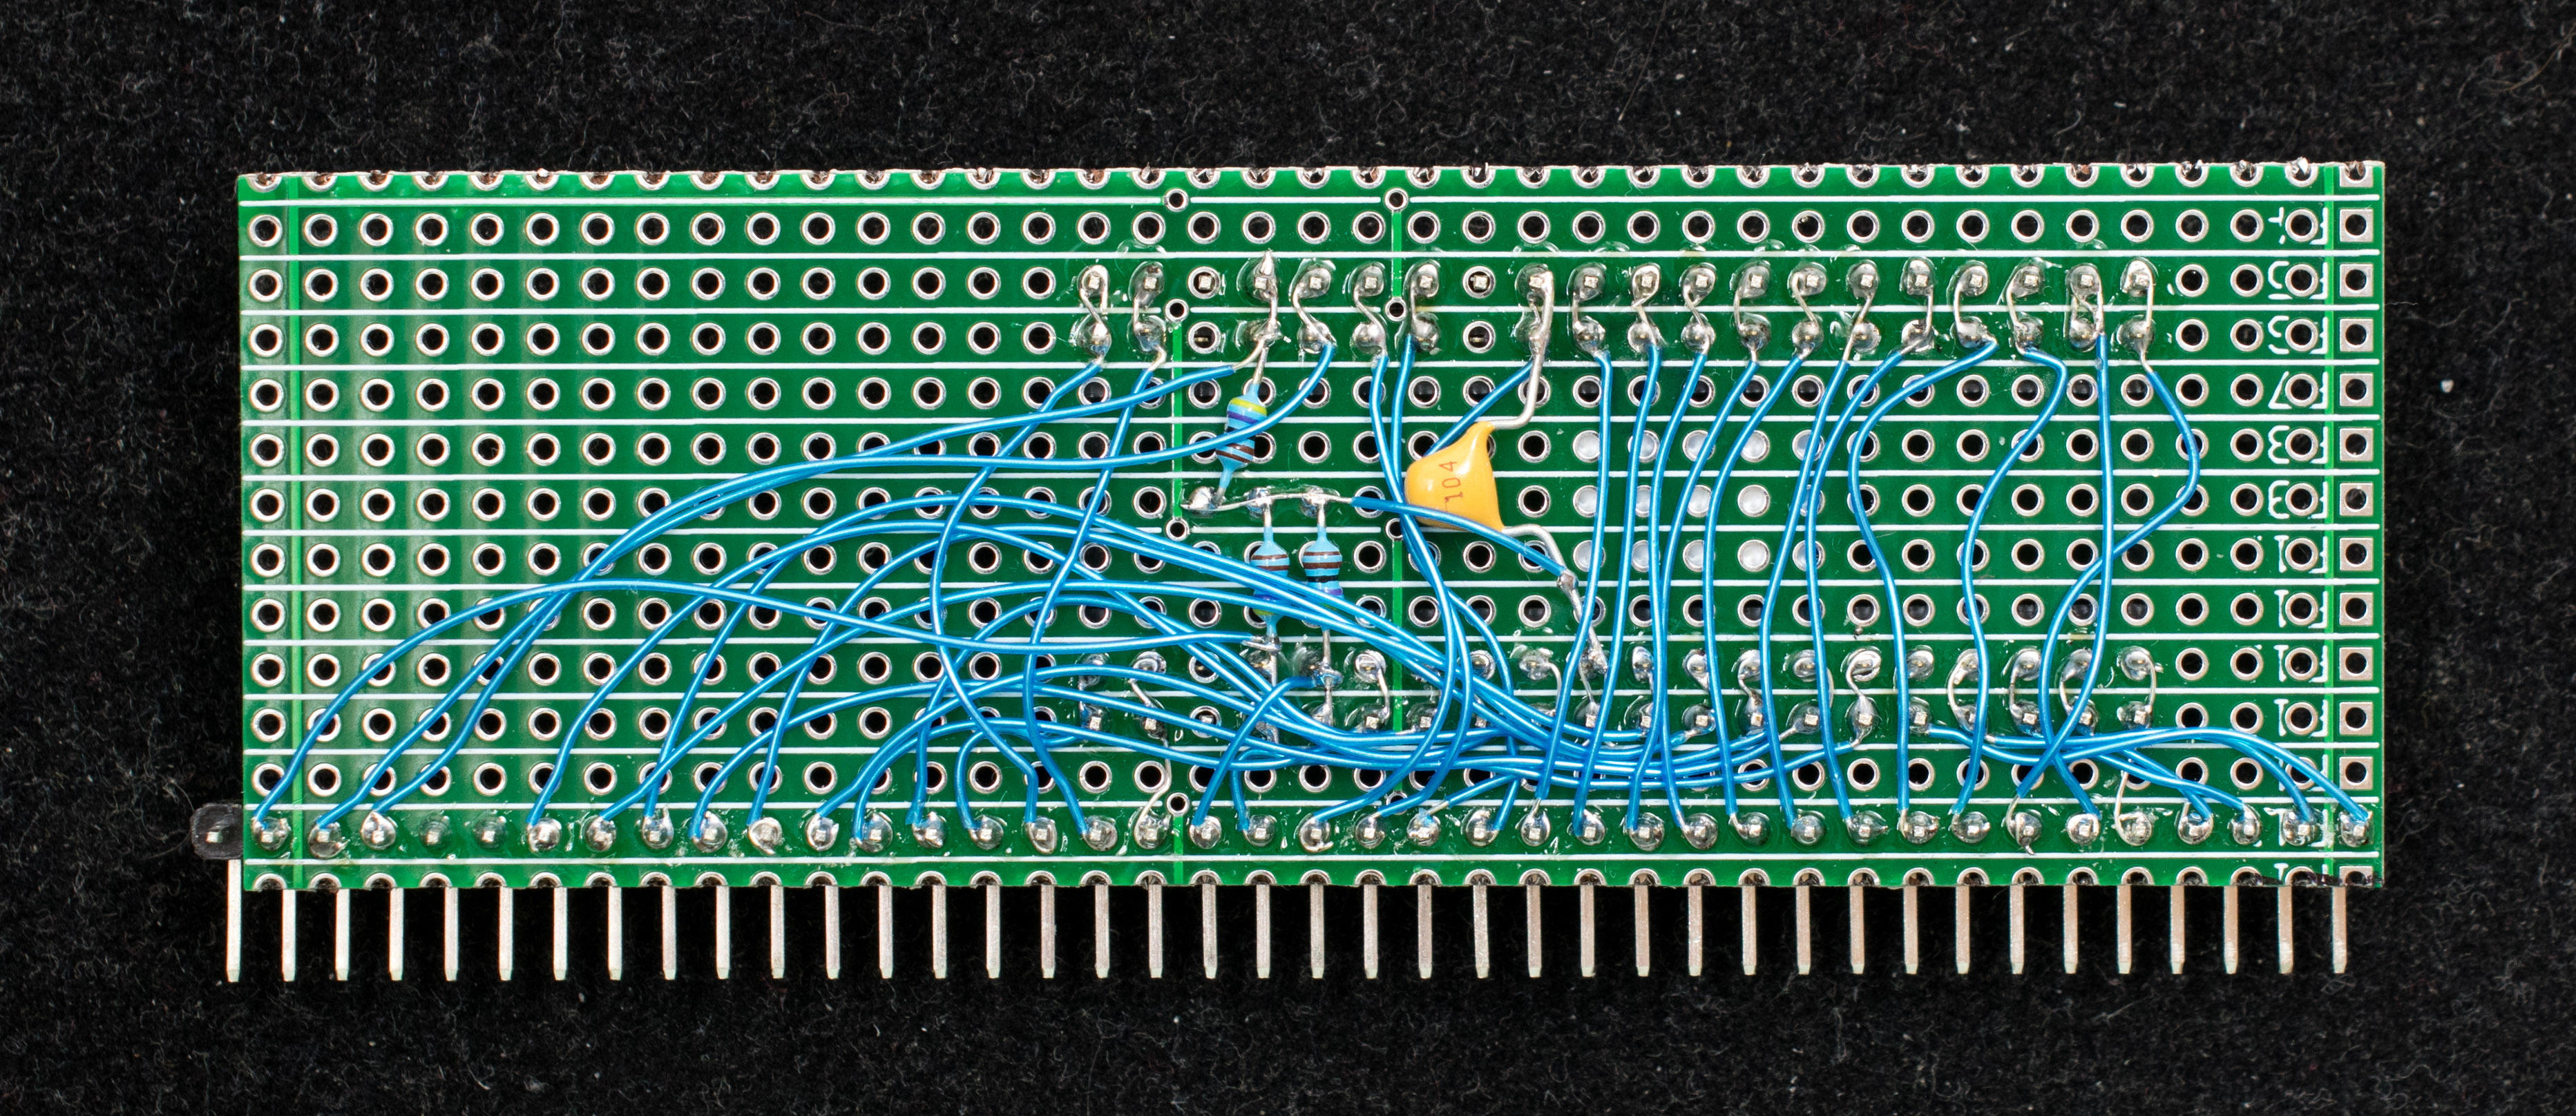 www.retrobrewcomputers.org_lib_plugins_ckgedit_fckeditor_userfiles_image_builderpages_plasmo_g8pp_g8ppz80_z80_cpu_solder.jpg